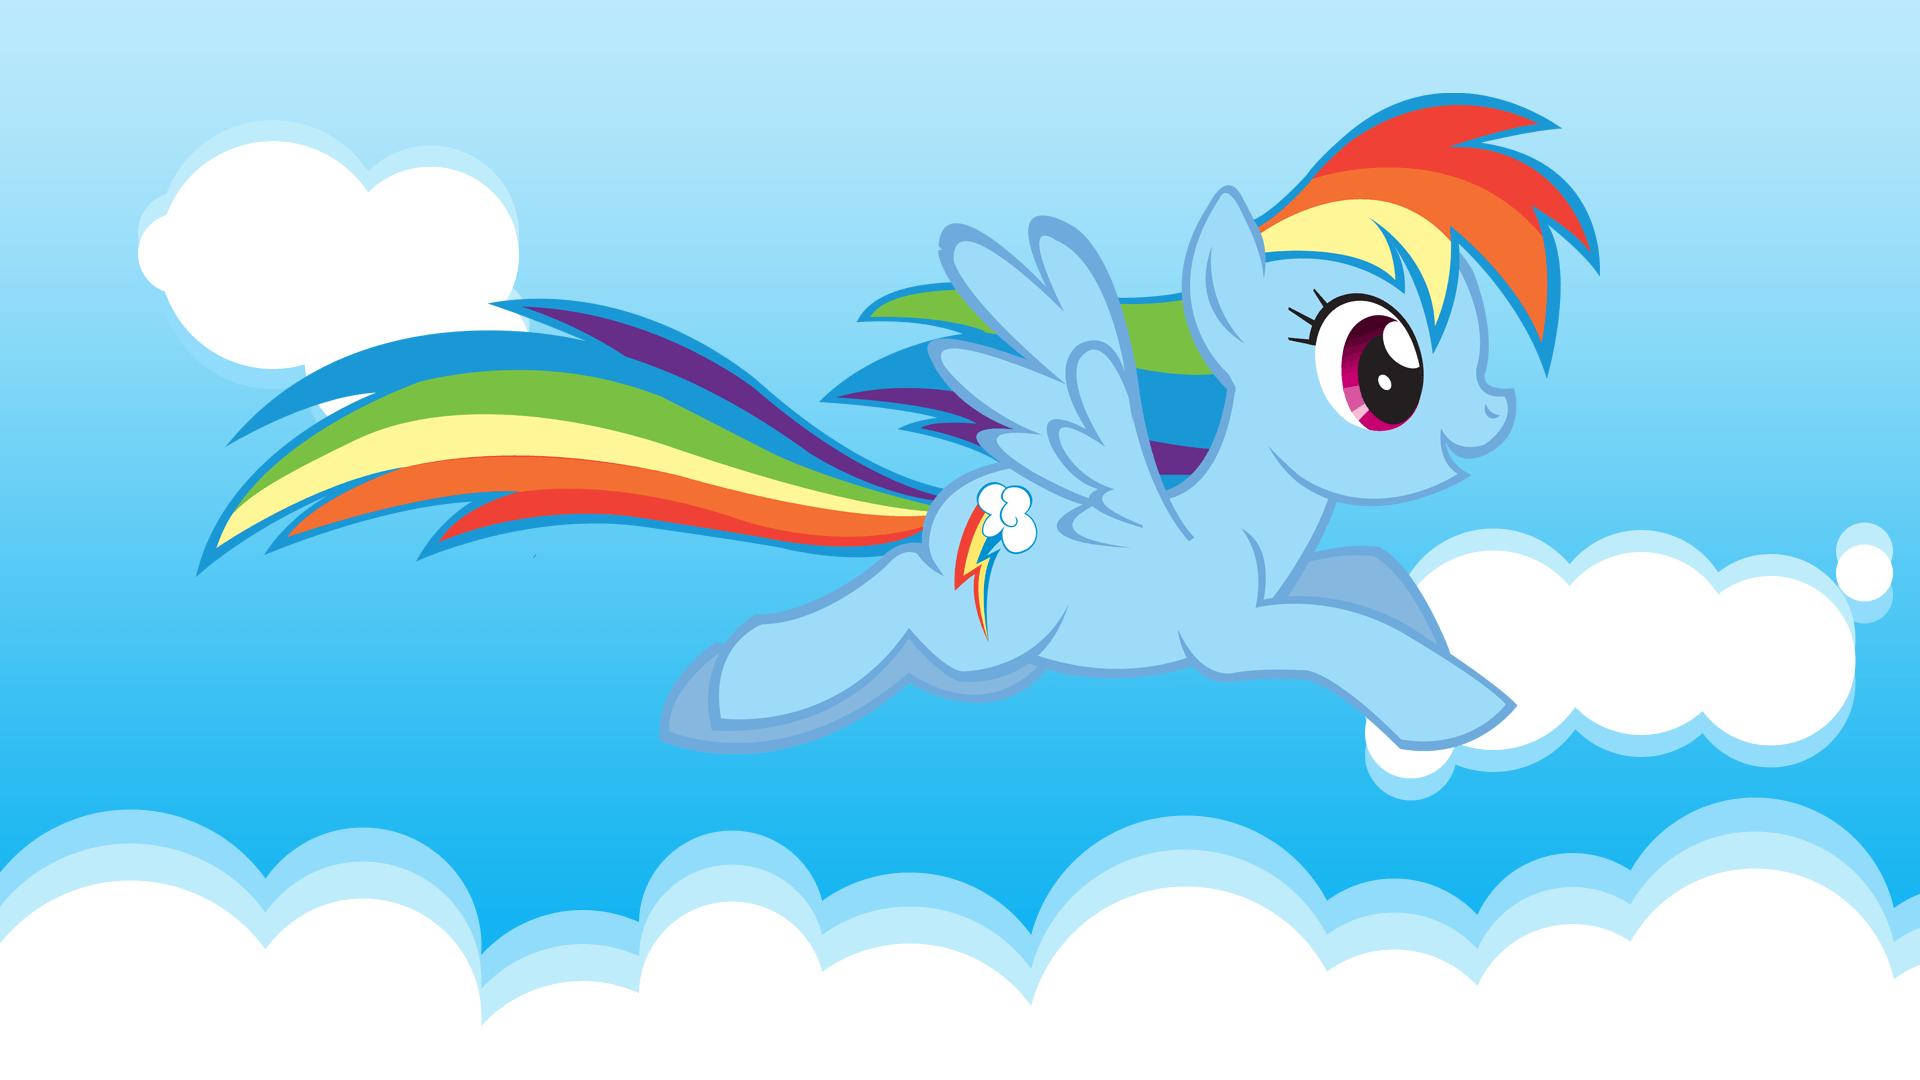 rainbow dash sphere background - photo #17